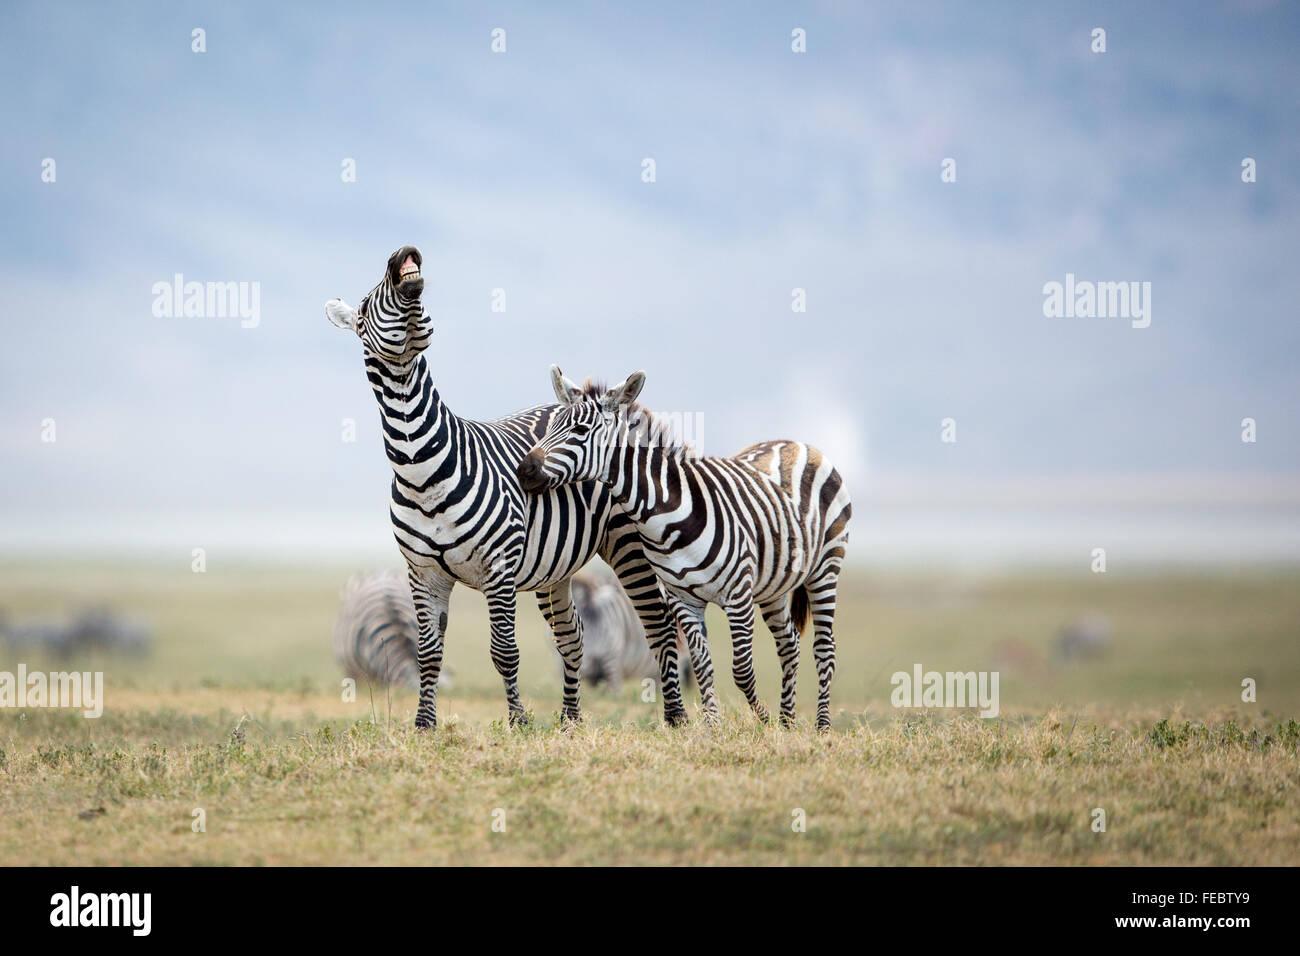 Two Plains Zebra fighting in the plains of Ngorongoro Crater Tanzania - Stock Image